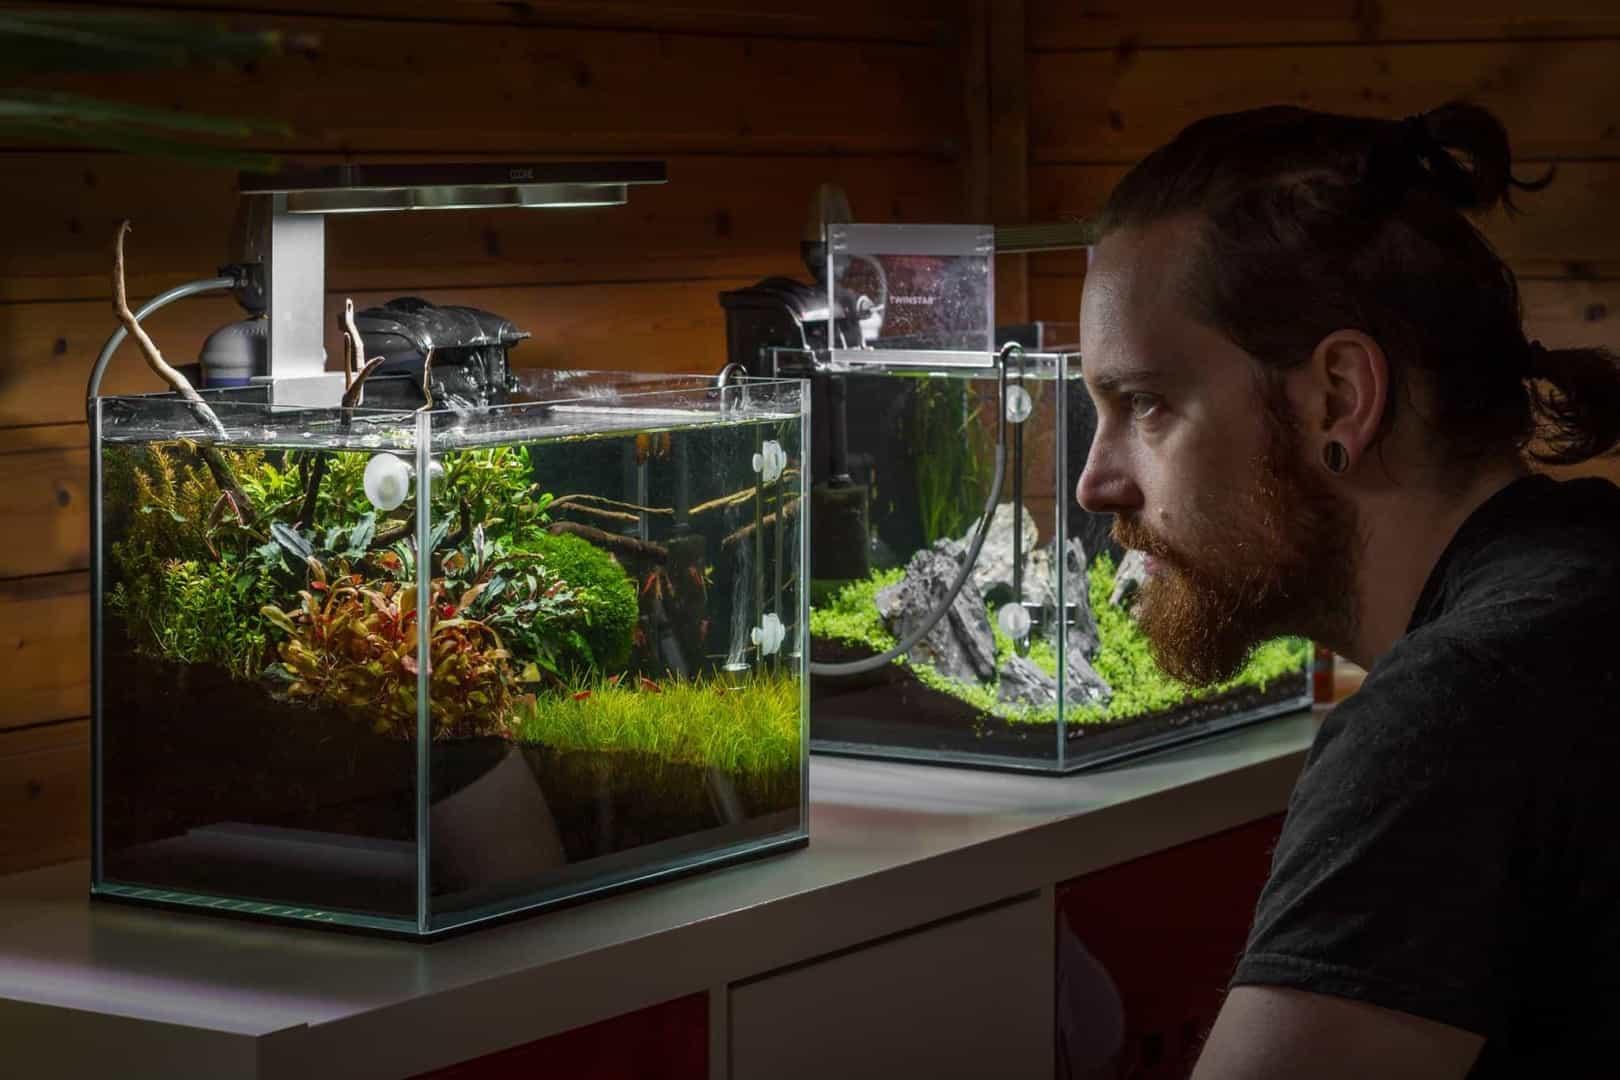 158 5 Tipps zur einfachen Aquarienpflege (Tobias Gawrisch aka AquaOwner) 4